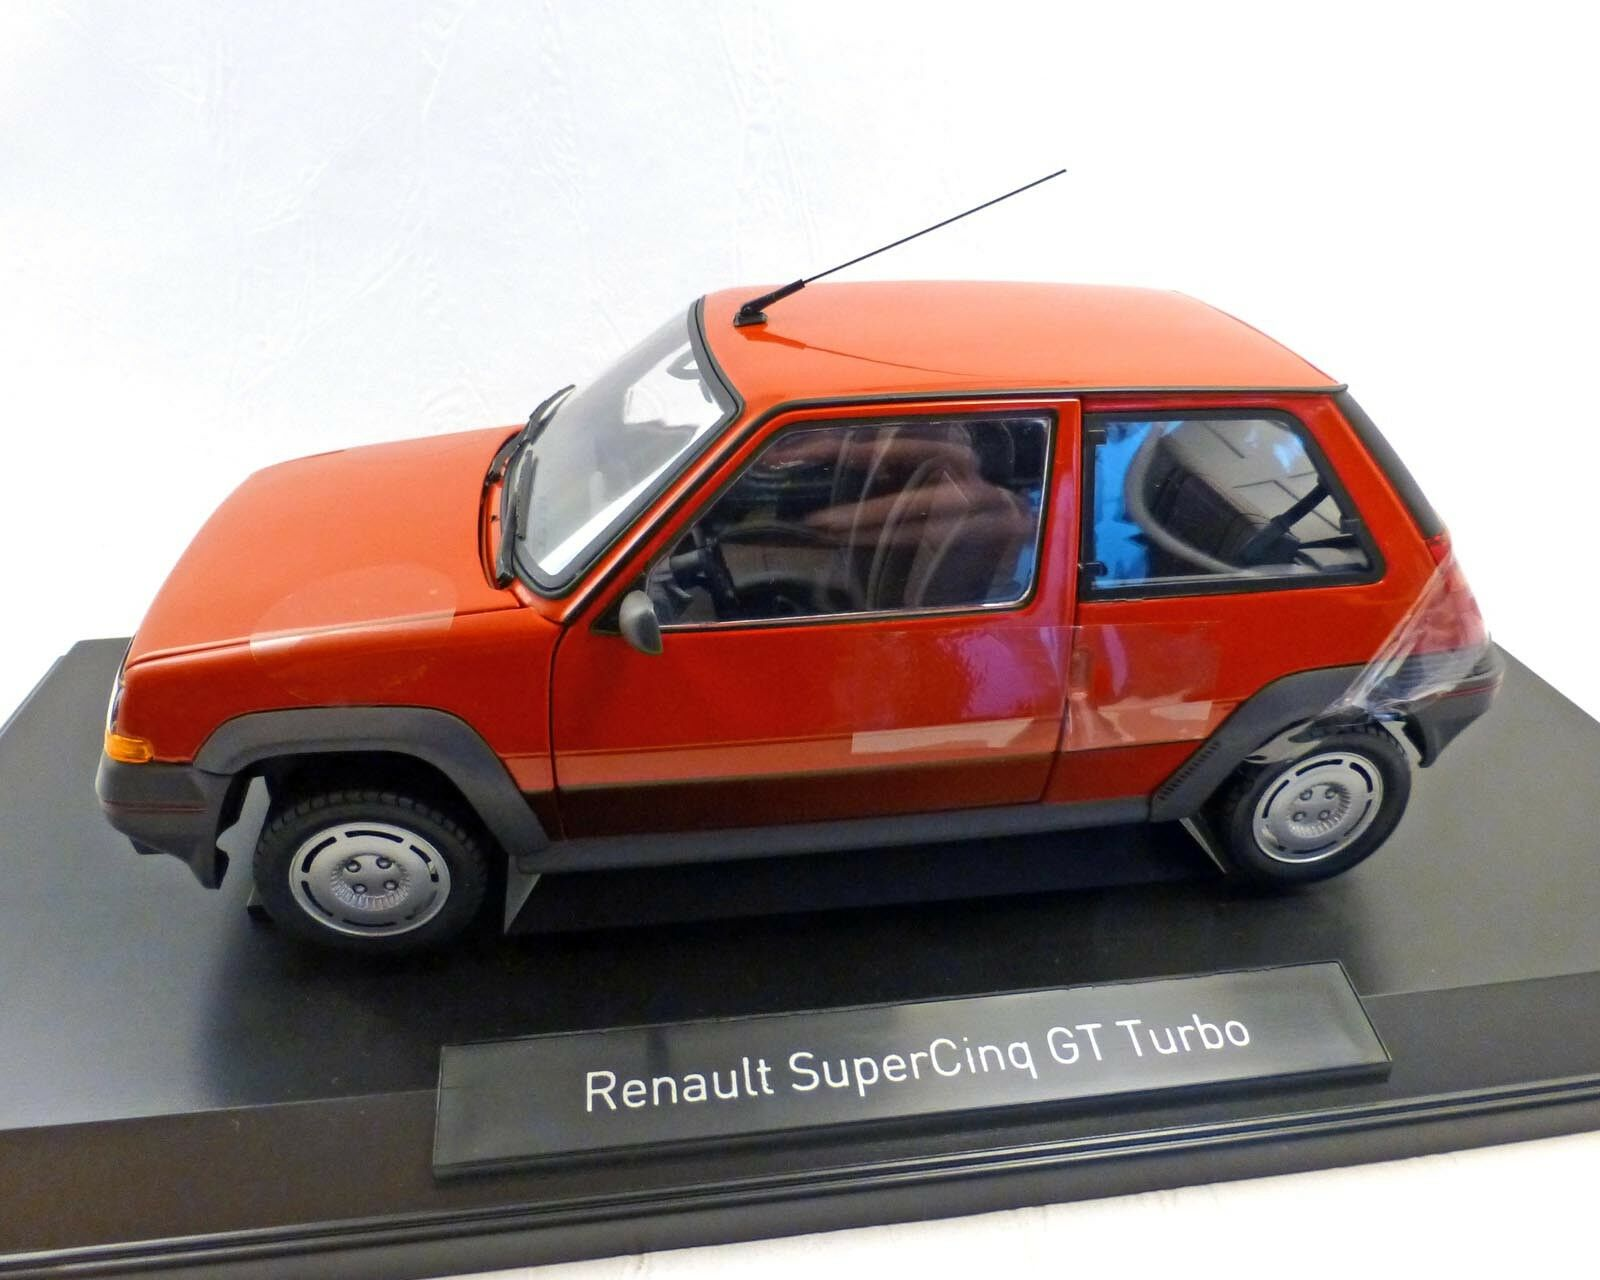 Renault r5 GT Turbo, 1 18 - norev